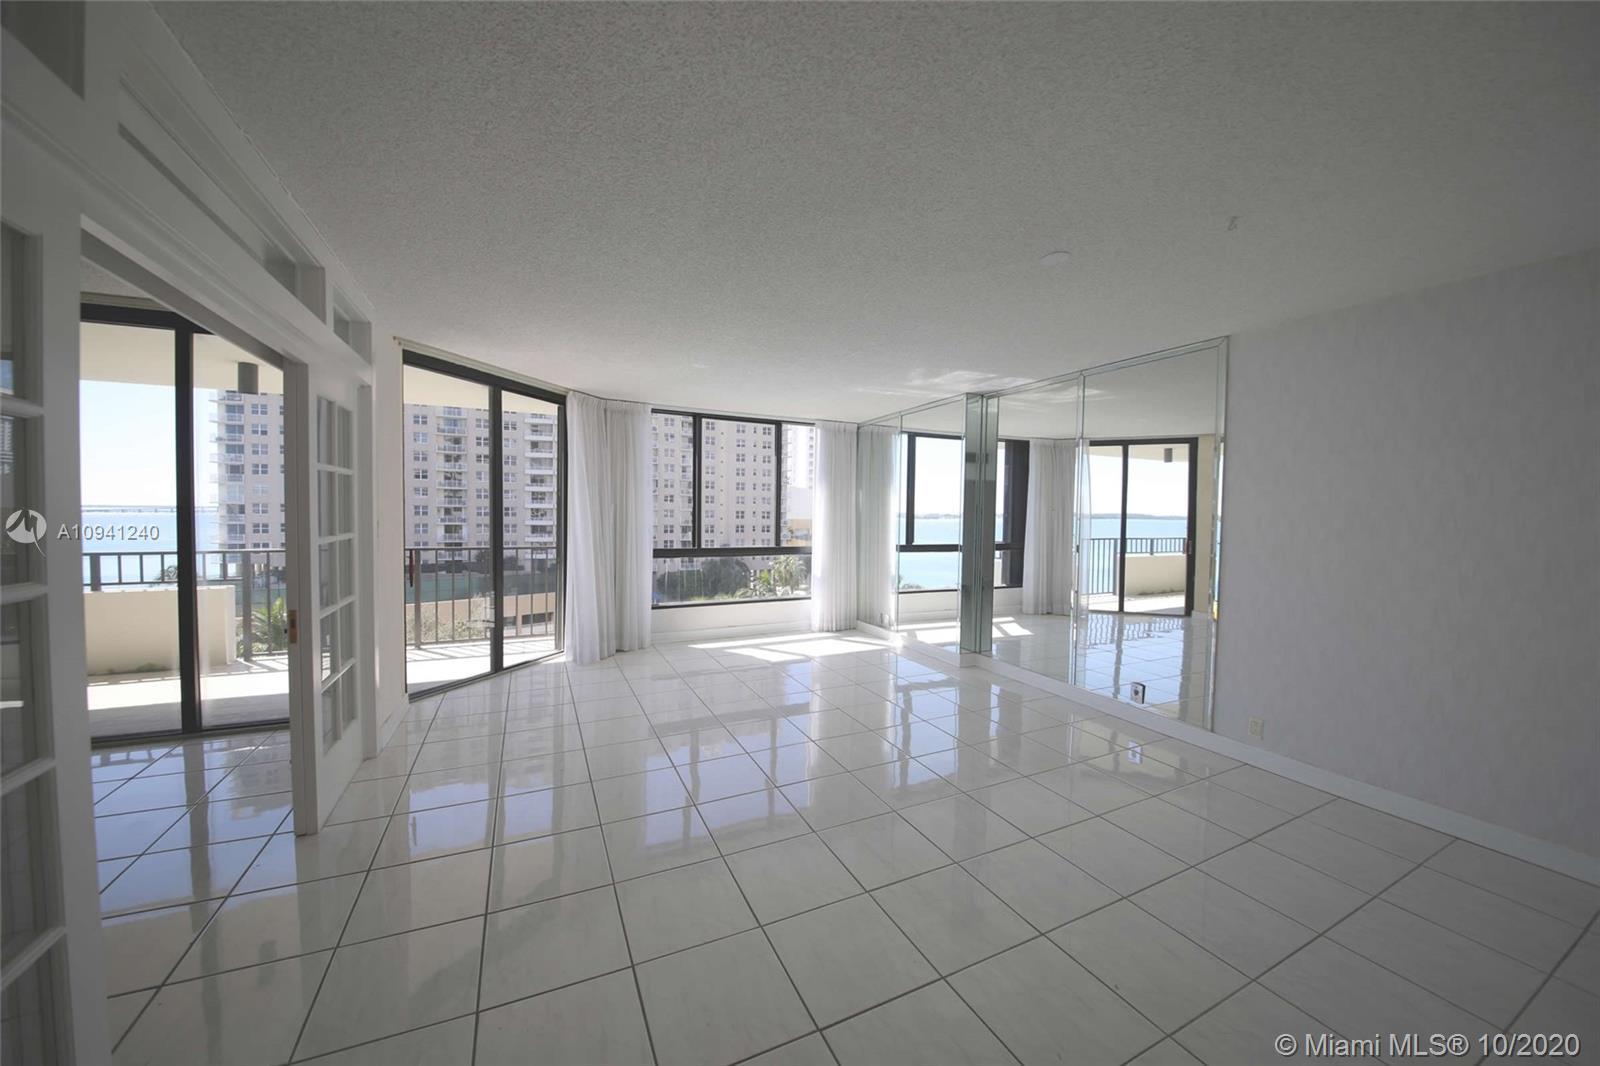 Brickell Key One Condo spacious 2 Bedroom 2 Bath large balconies, water views, city views. Heated sw